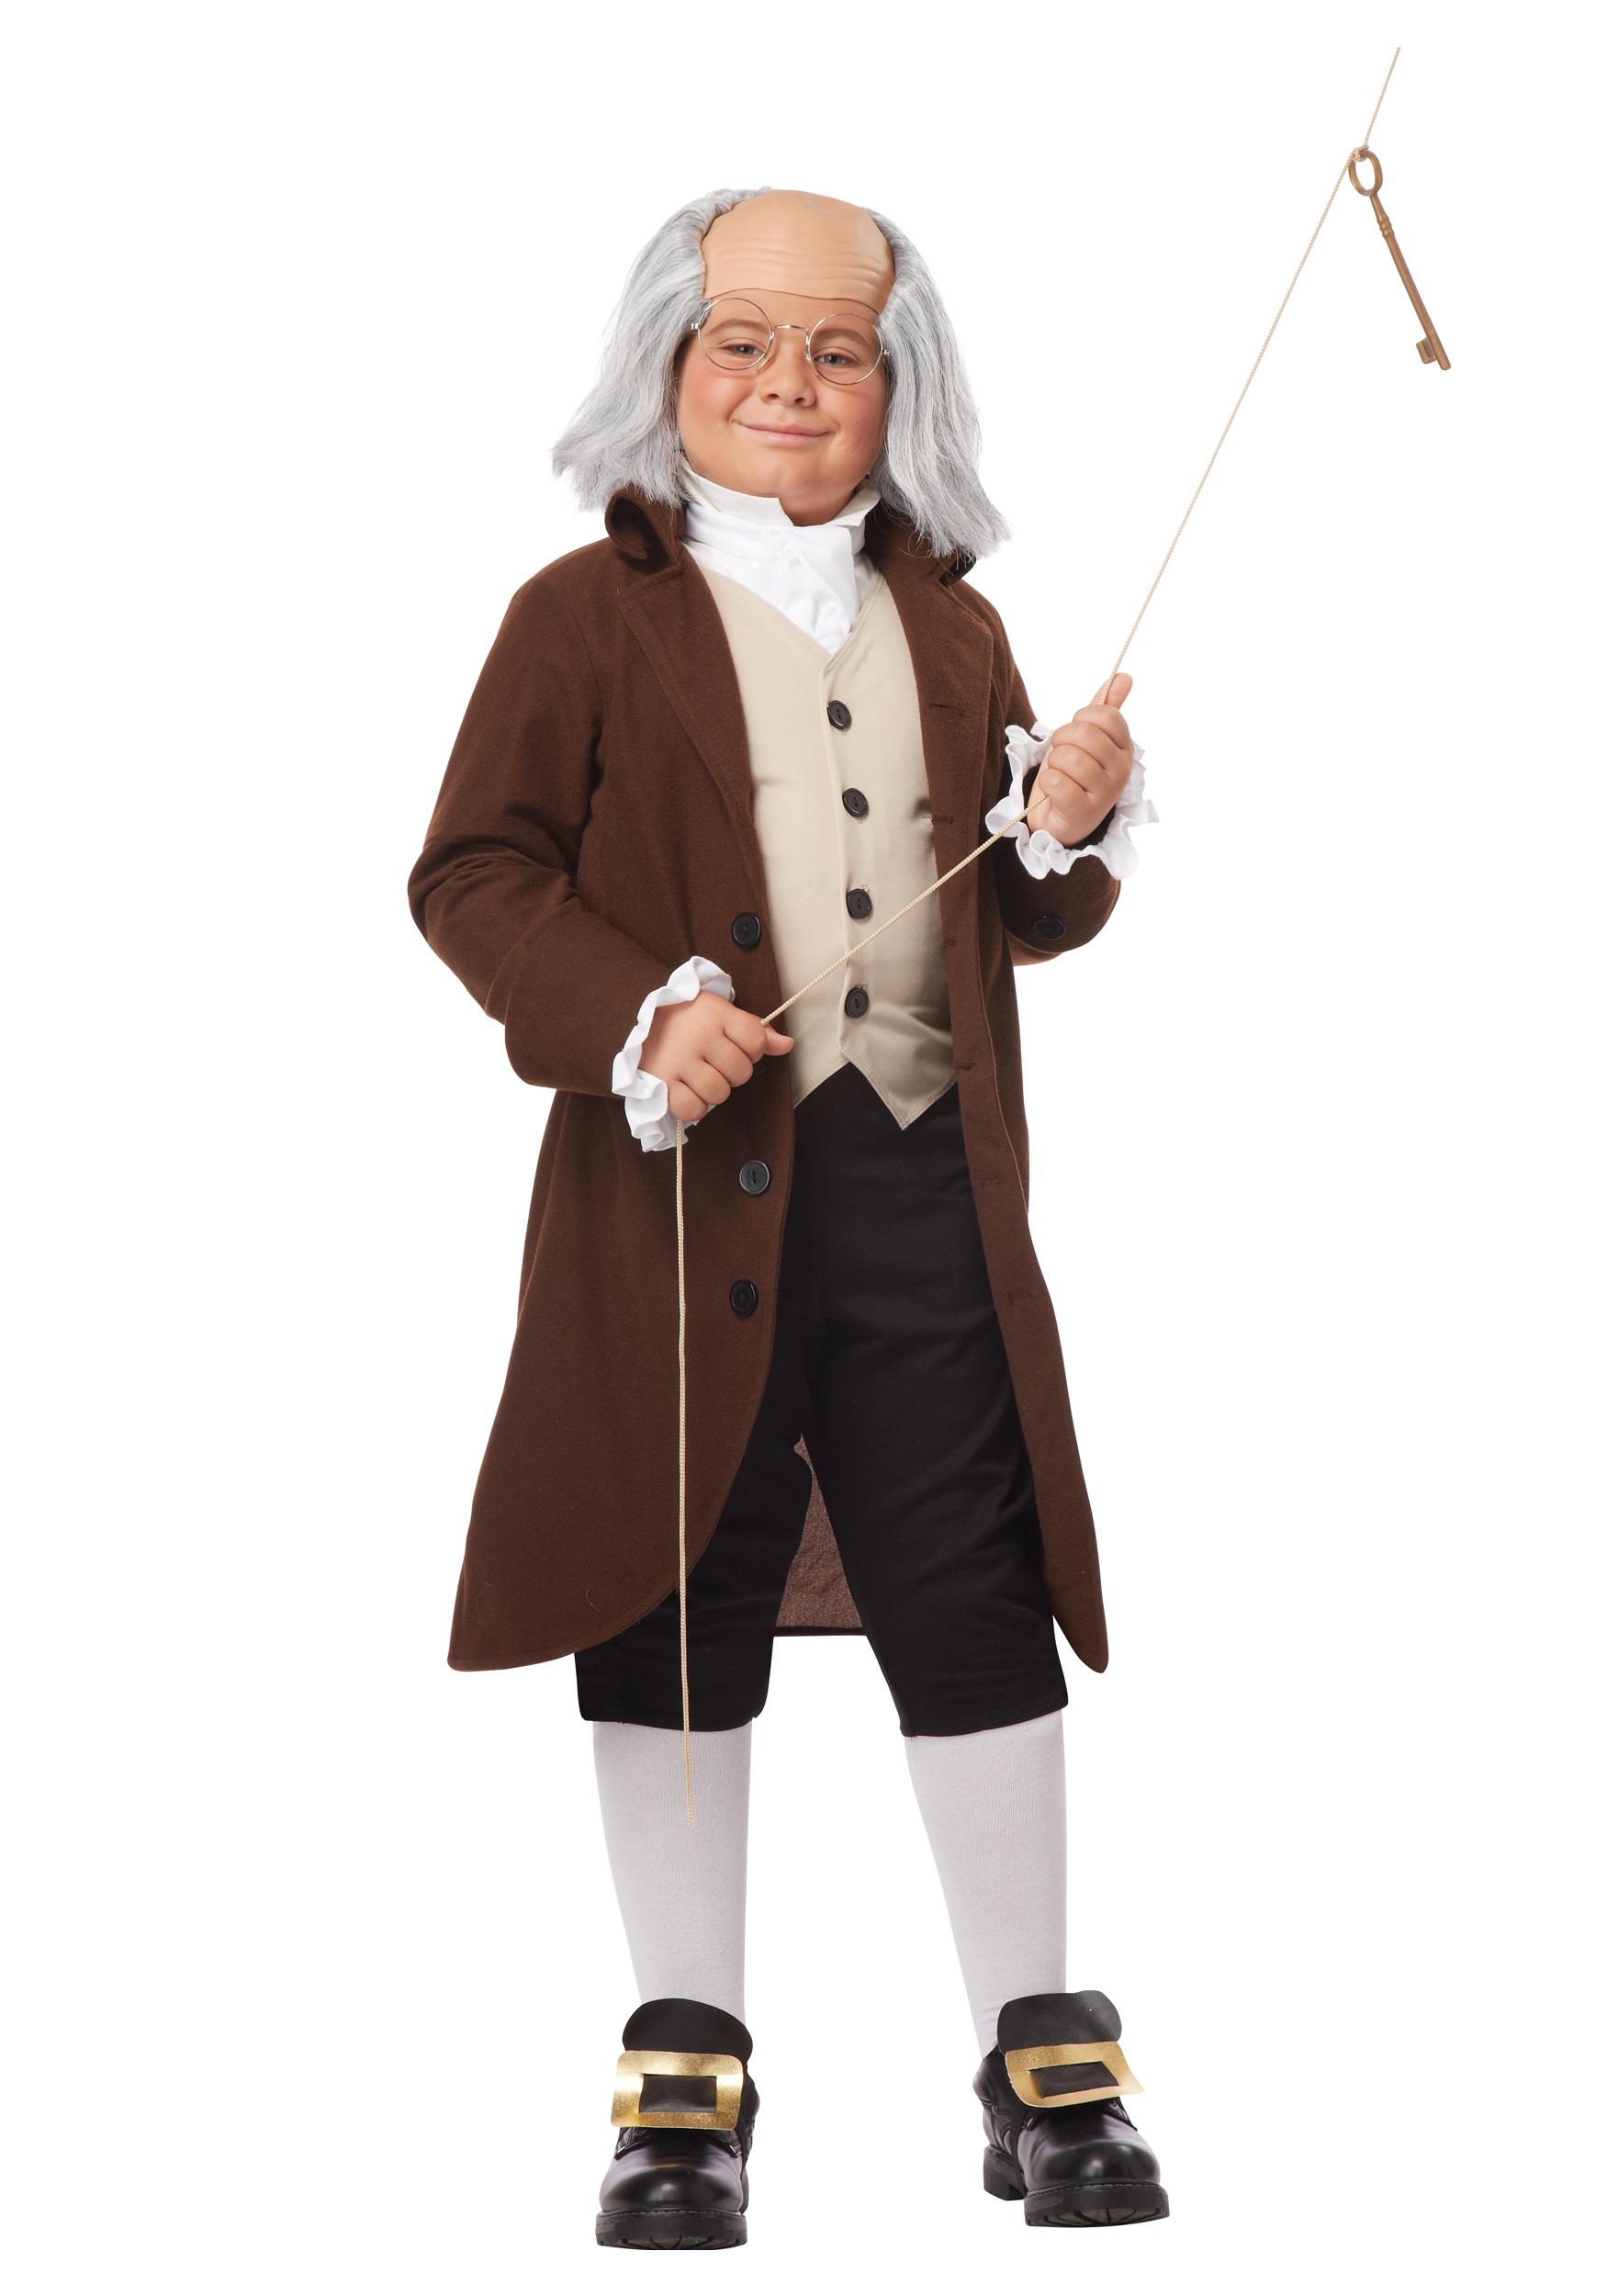 Benjamin Franklin Boys Costume | Historical Figure Costume